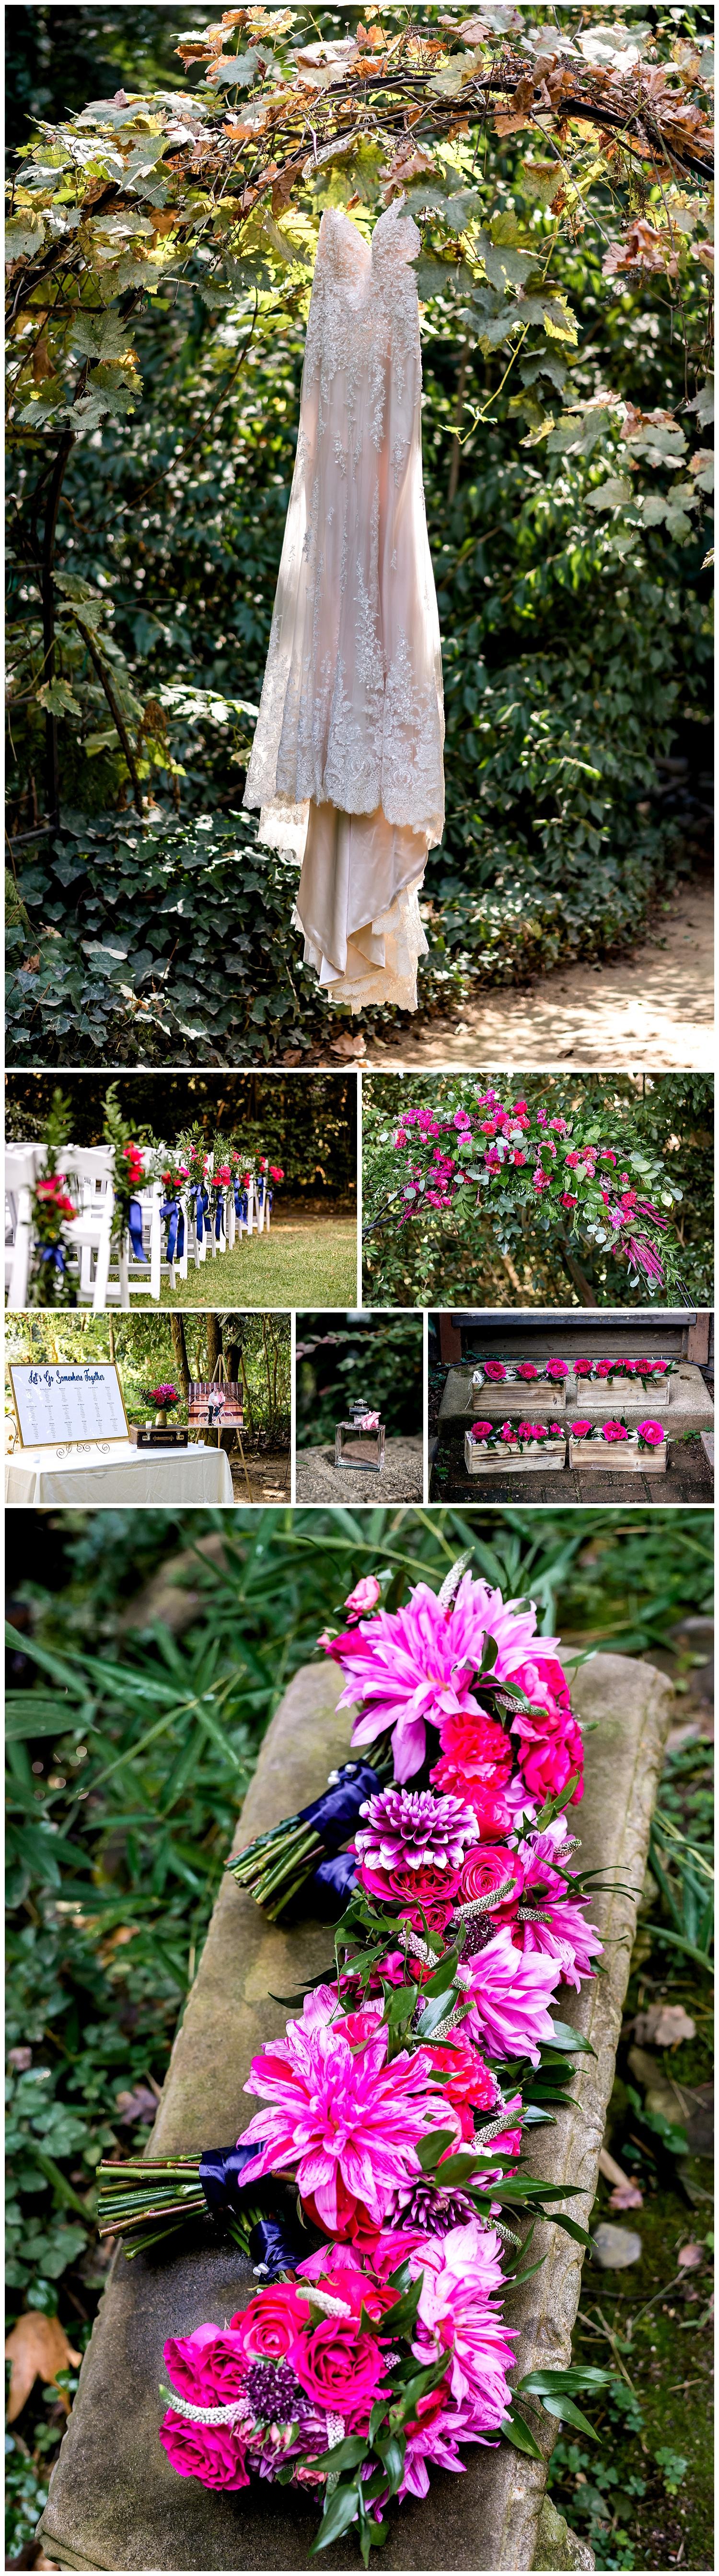 the-530-bride_Gale-vineyards-wedding-js